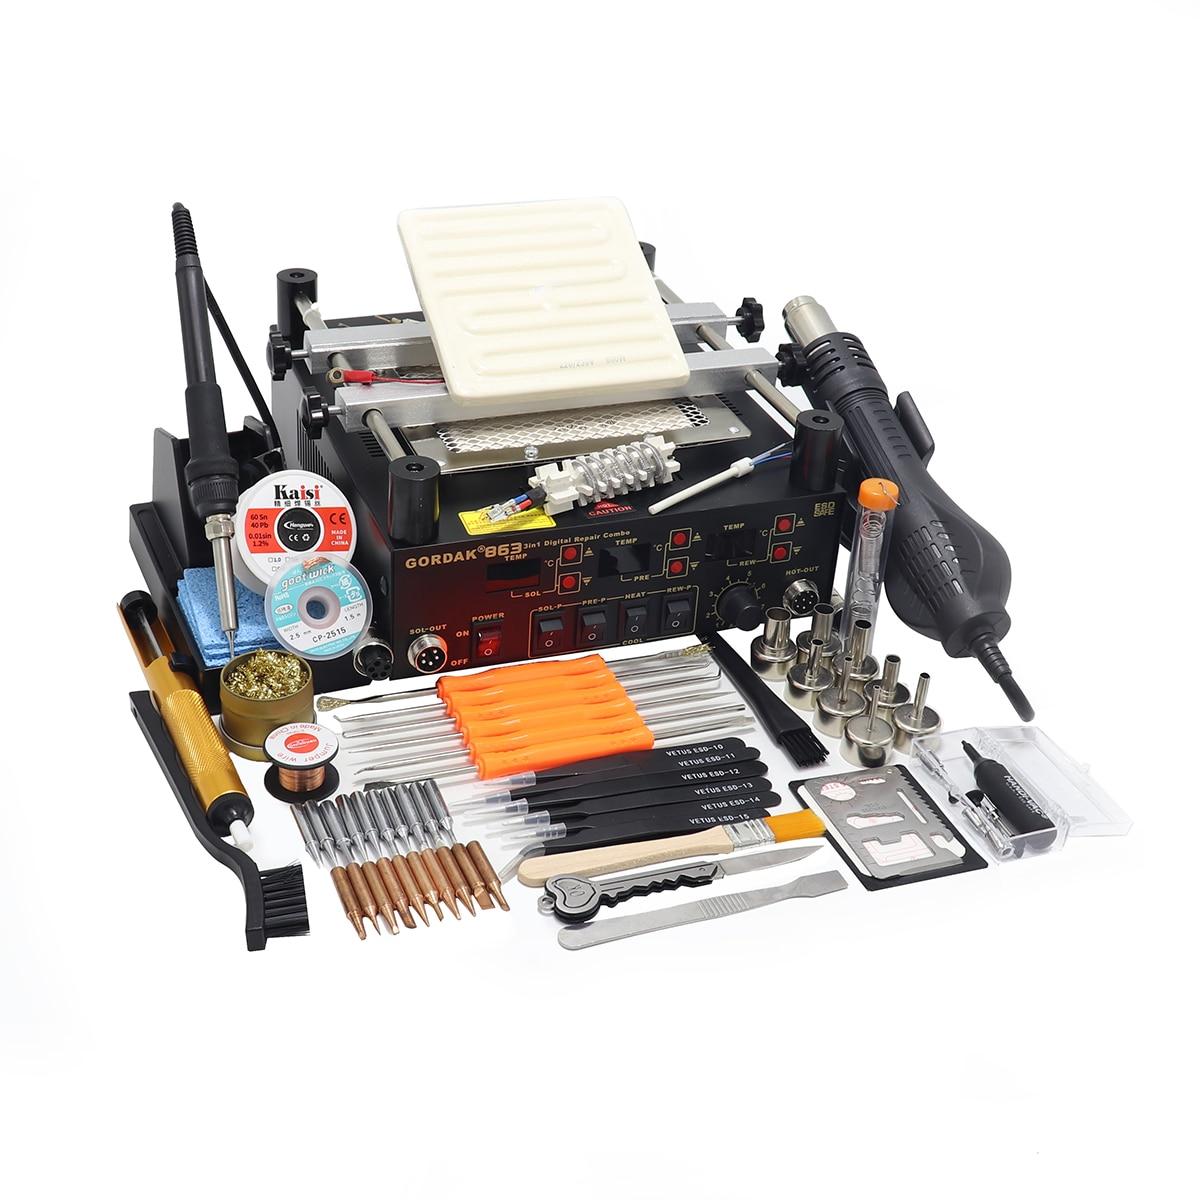 gordak-863-3-in-1-digita-hot-air-heat-gun-bga-rework-solder-station-electric-soldering-iron-ir-infrared-preheating-station